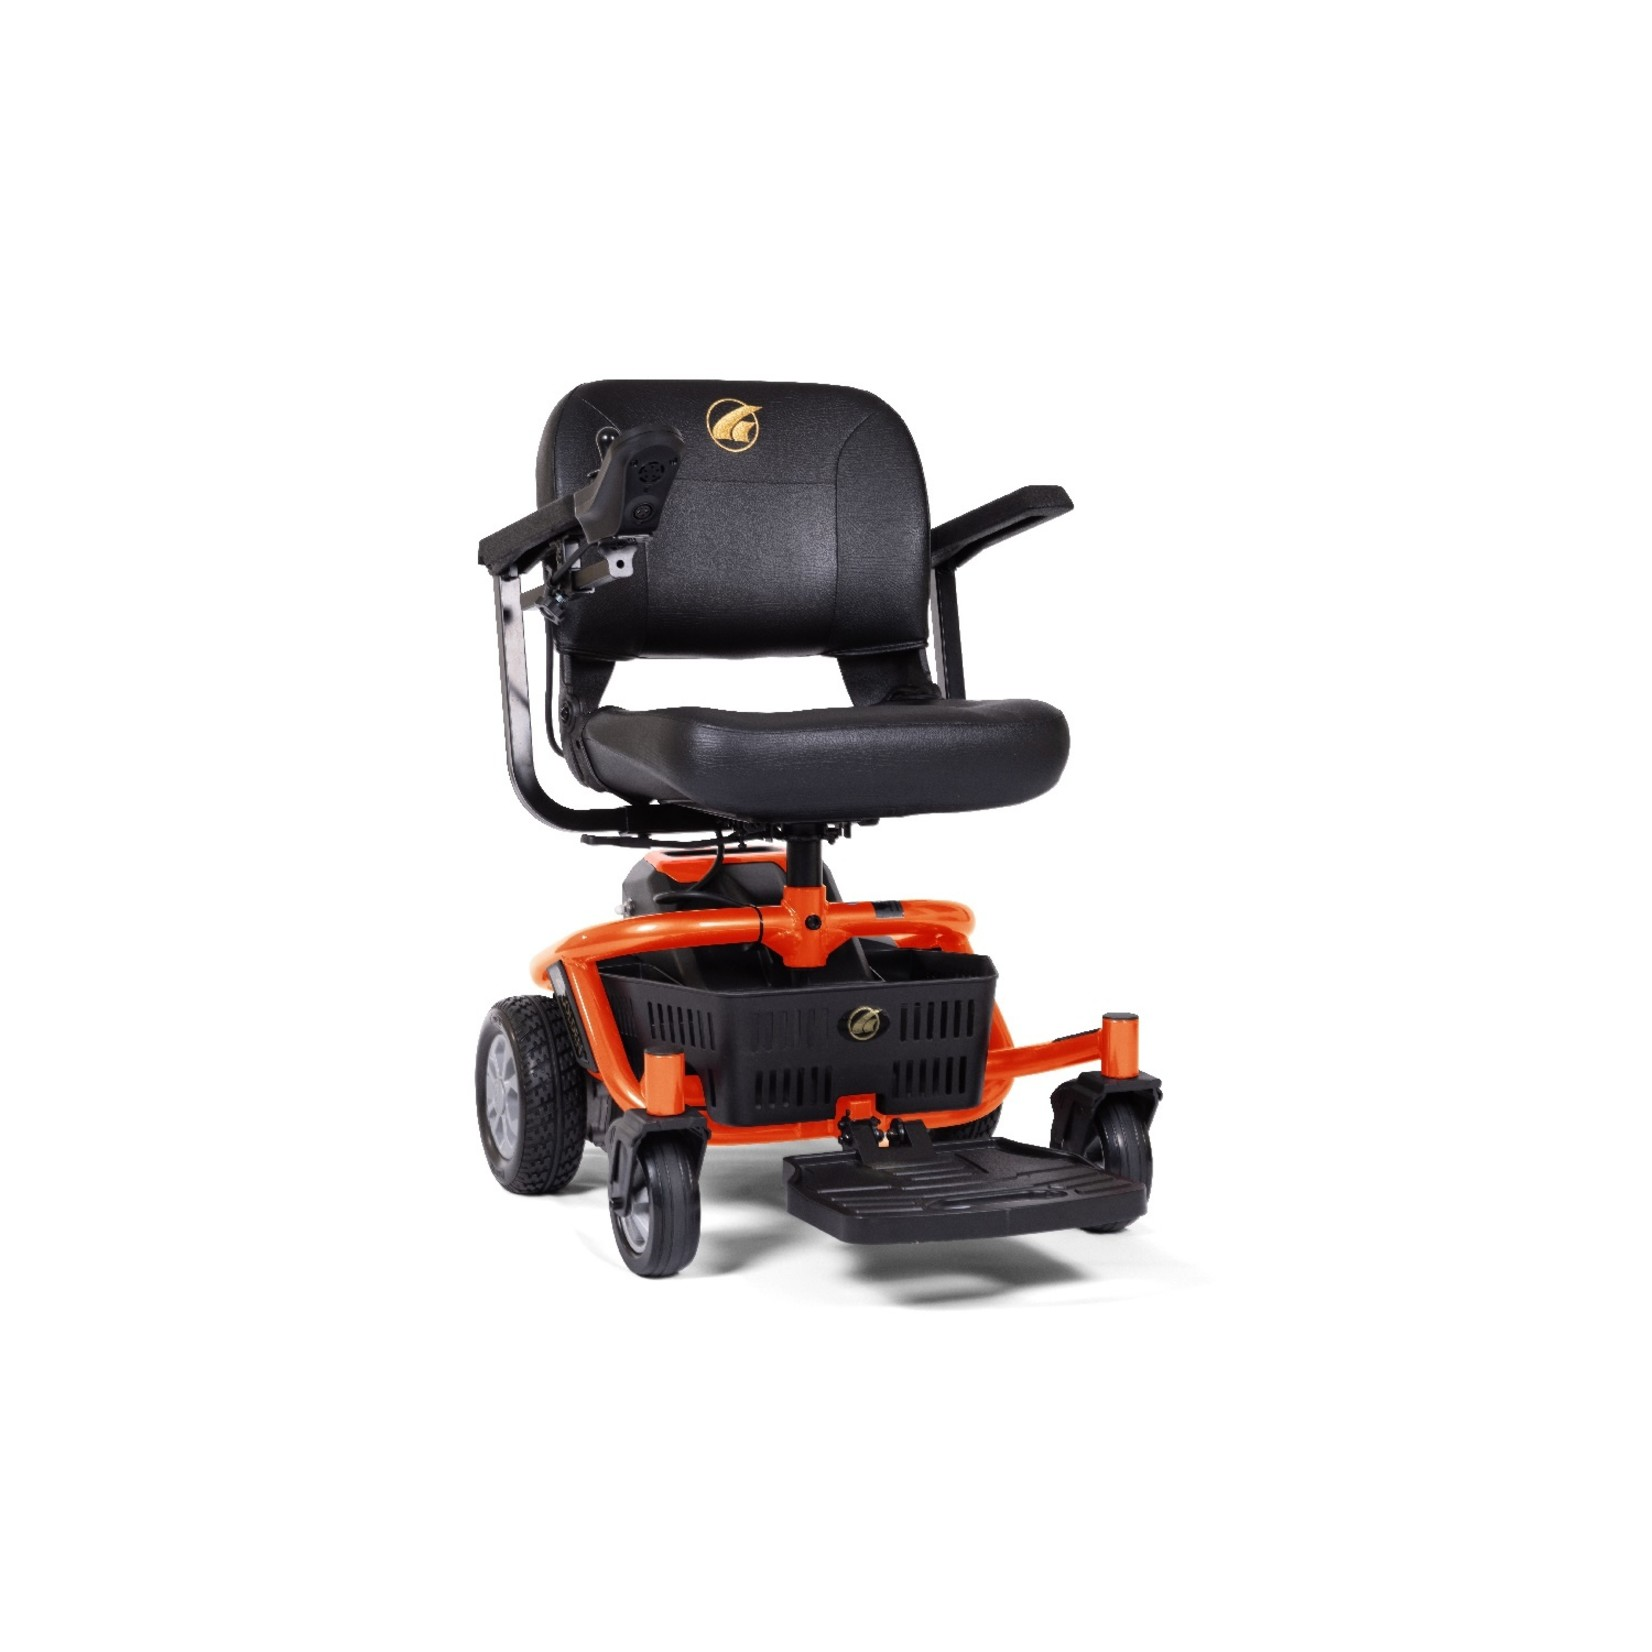 Golden Technologies Literider Envy Power Chair